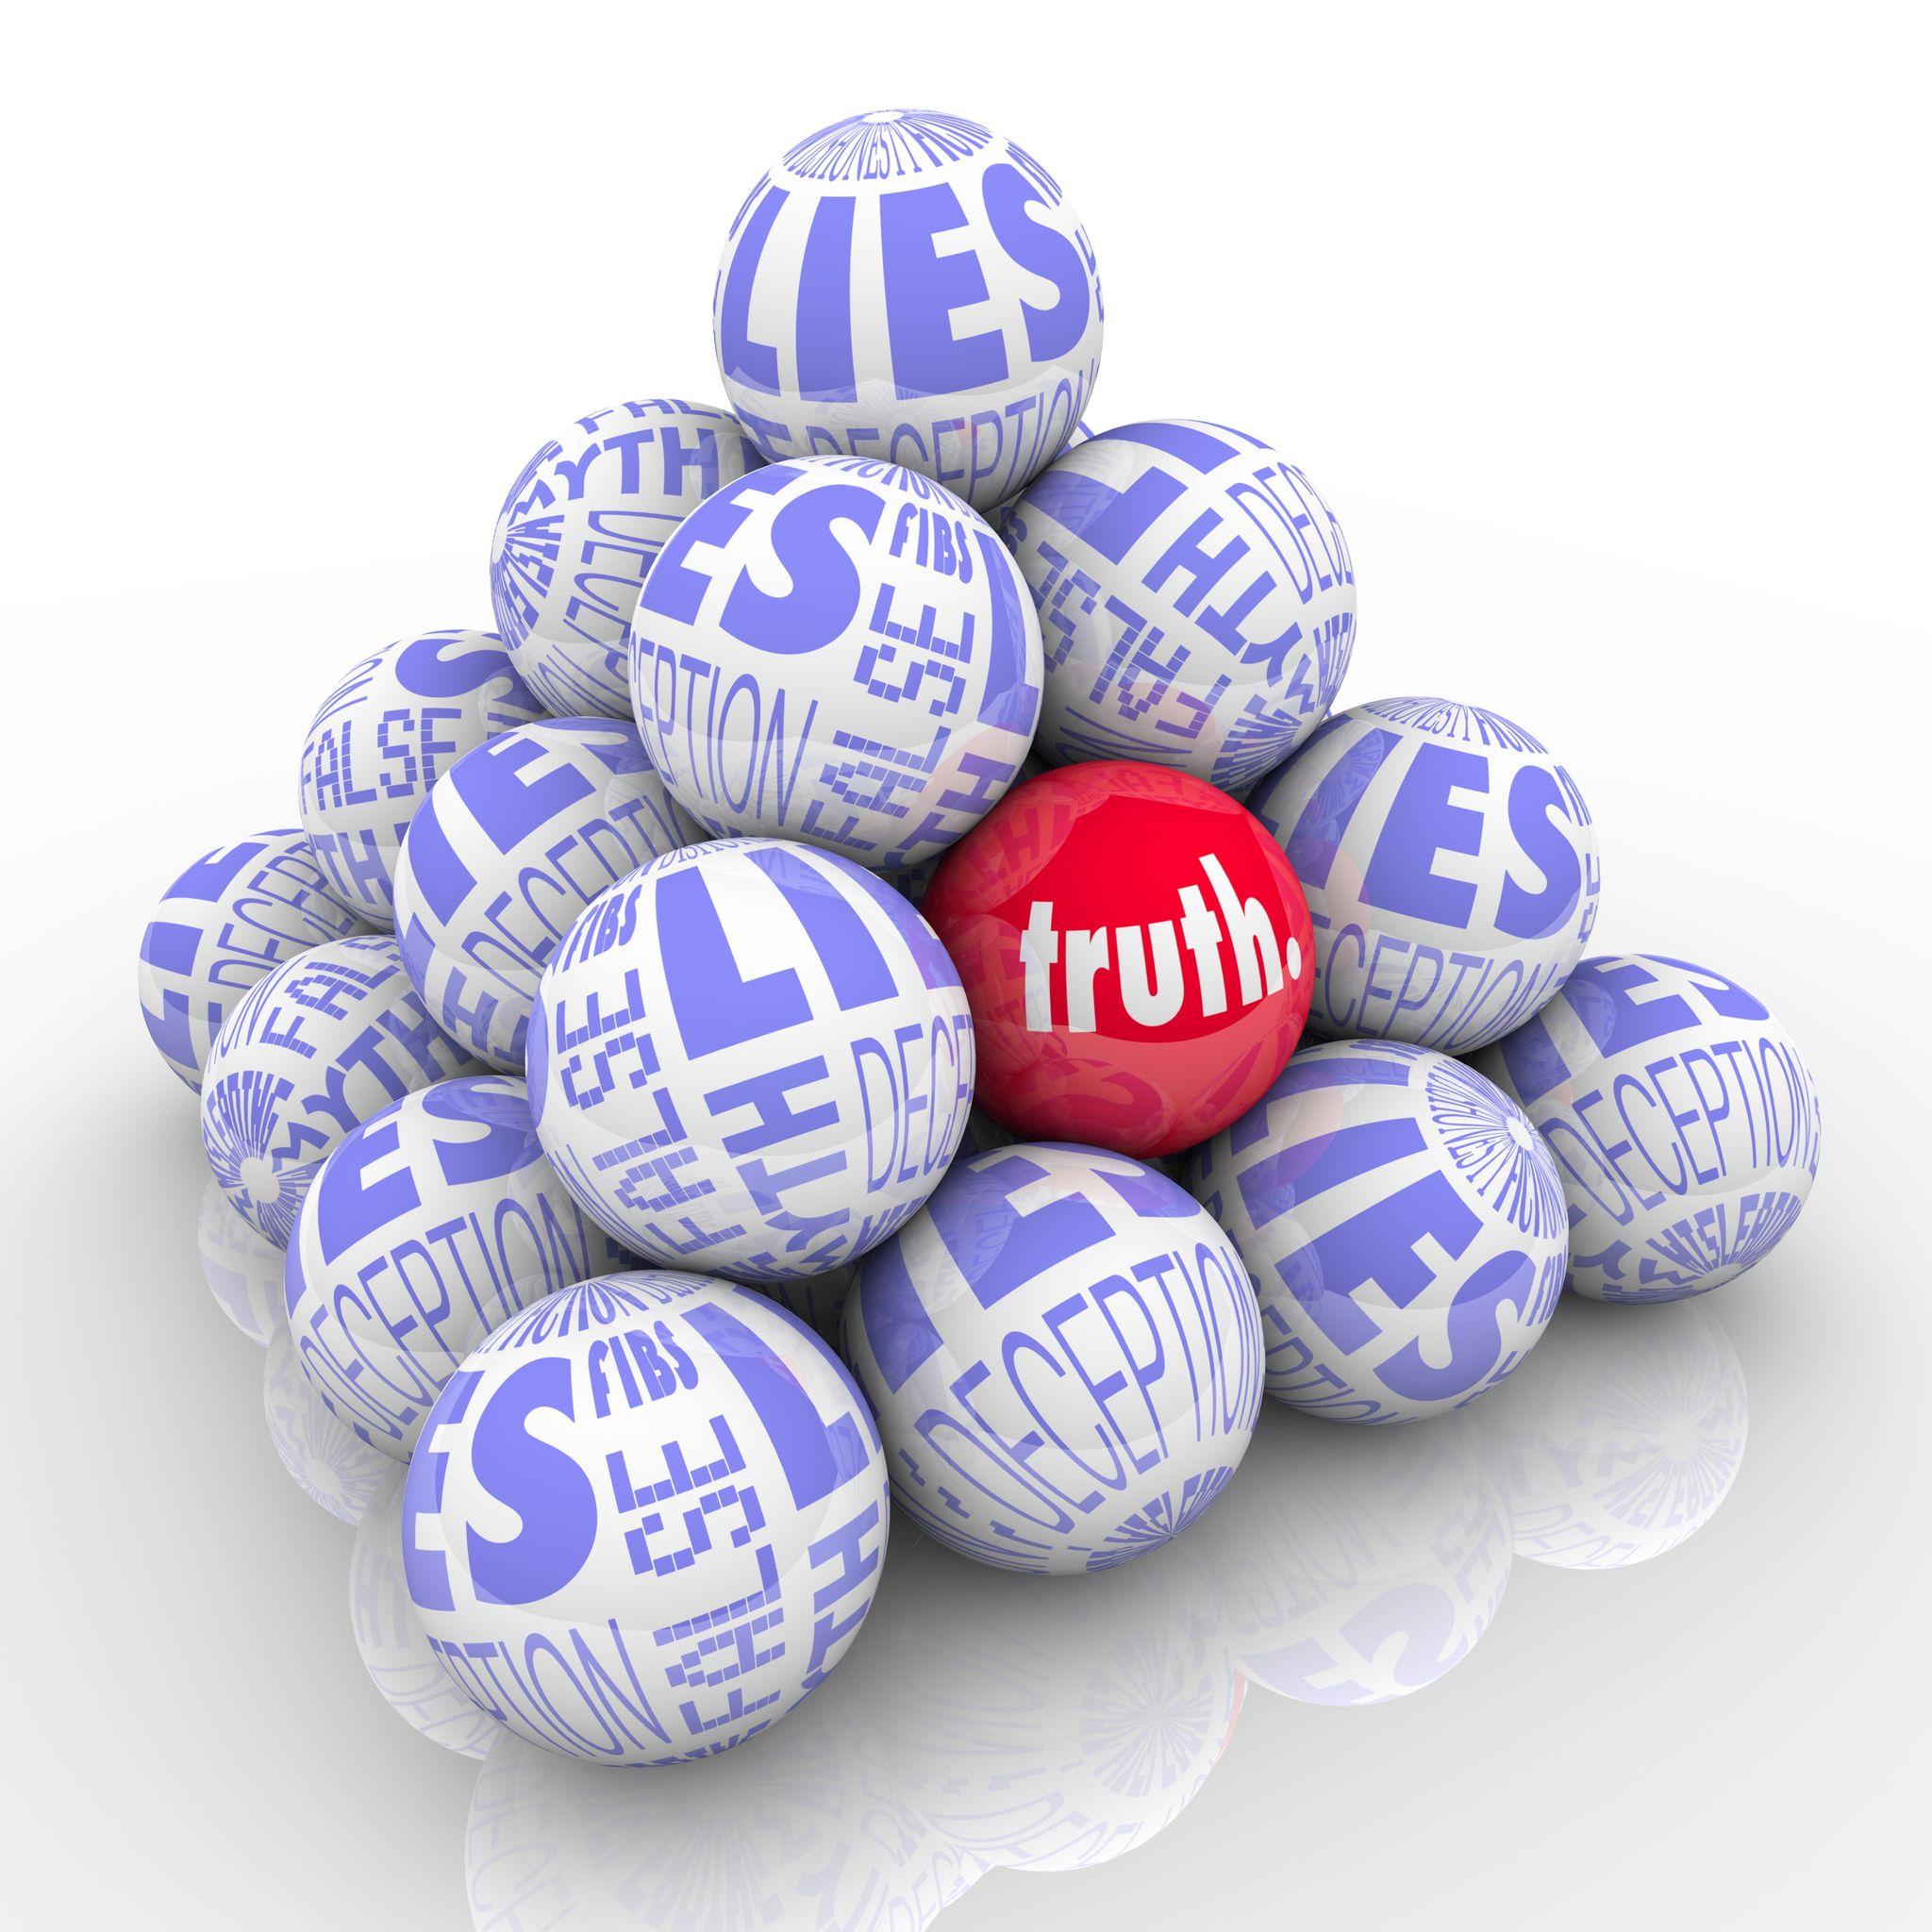 balls-say-lies-truth